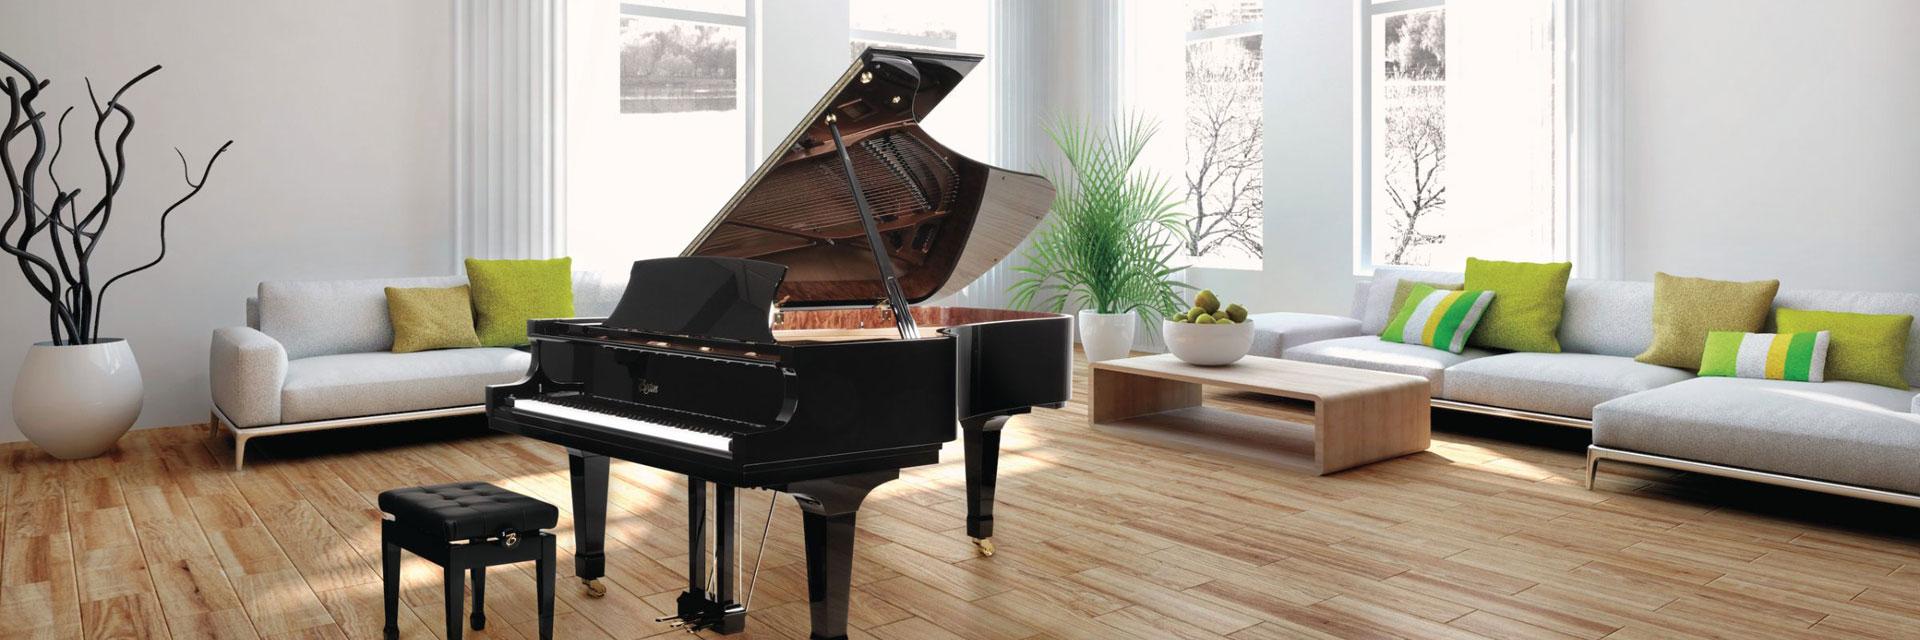 Flügel kaufen bei Piano Gäbler in Dresden